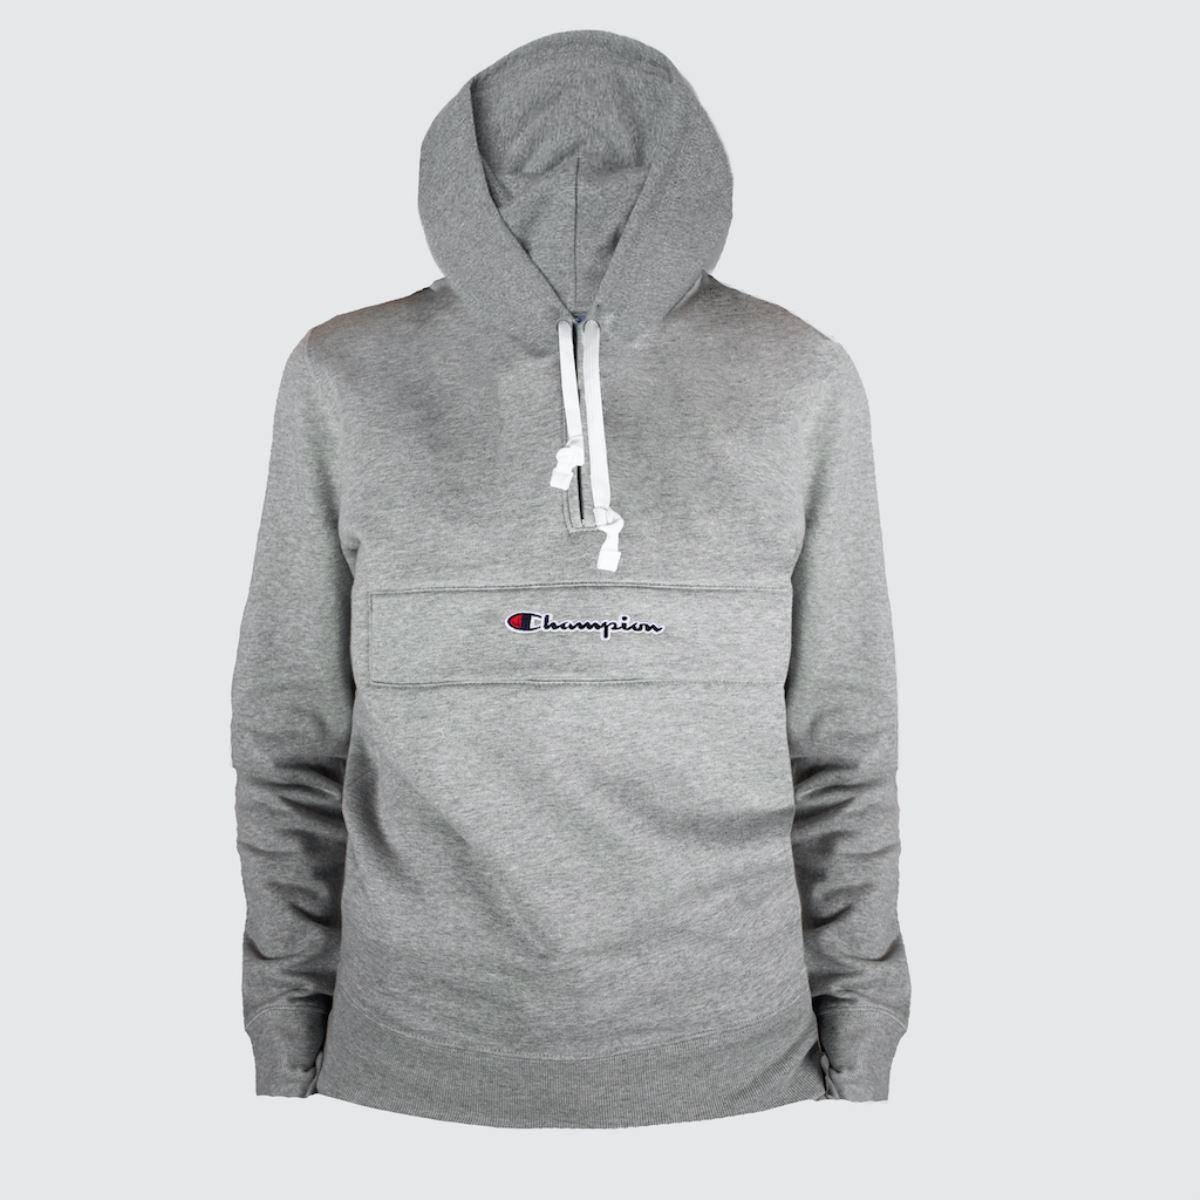 Champion Light Grey Half Zipped Sweatshir